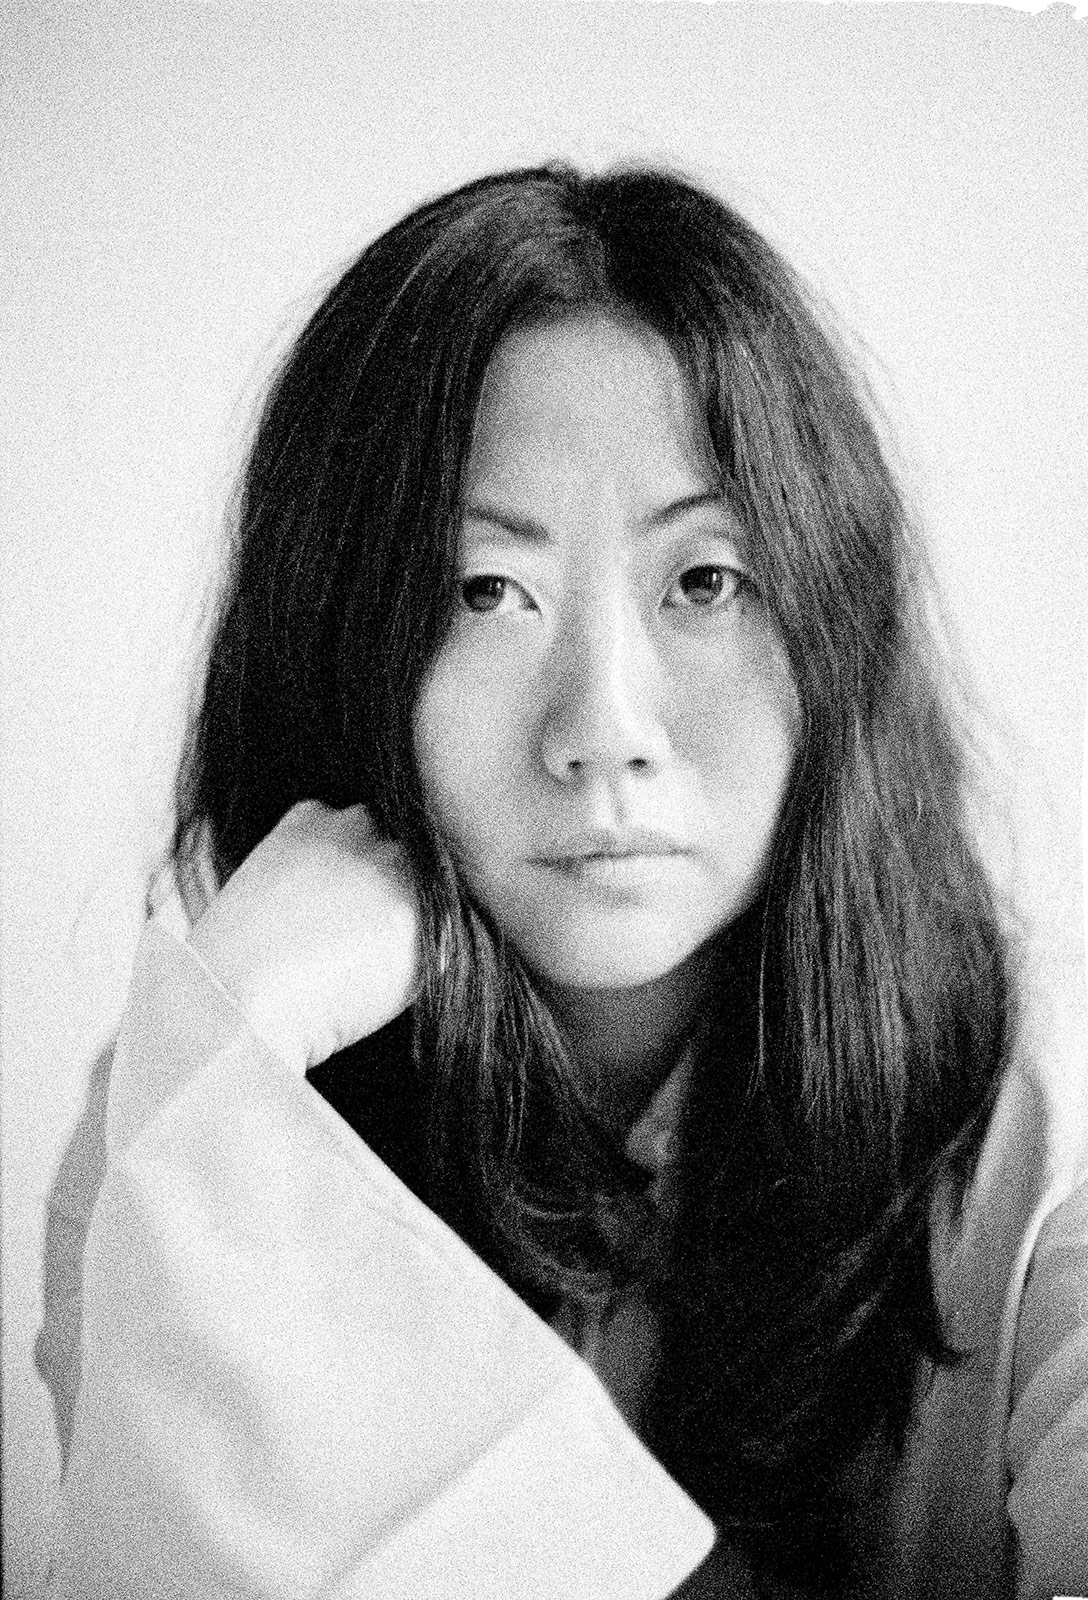 Hyun mi nielsen metalmagazine